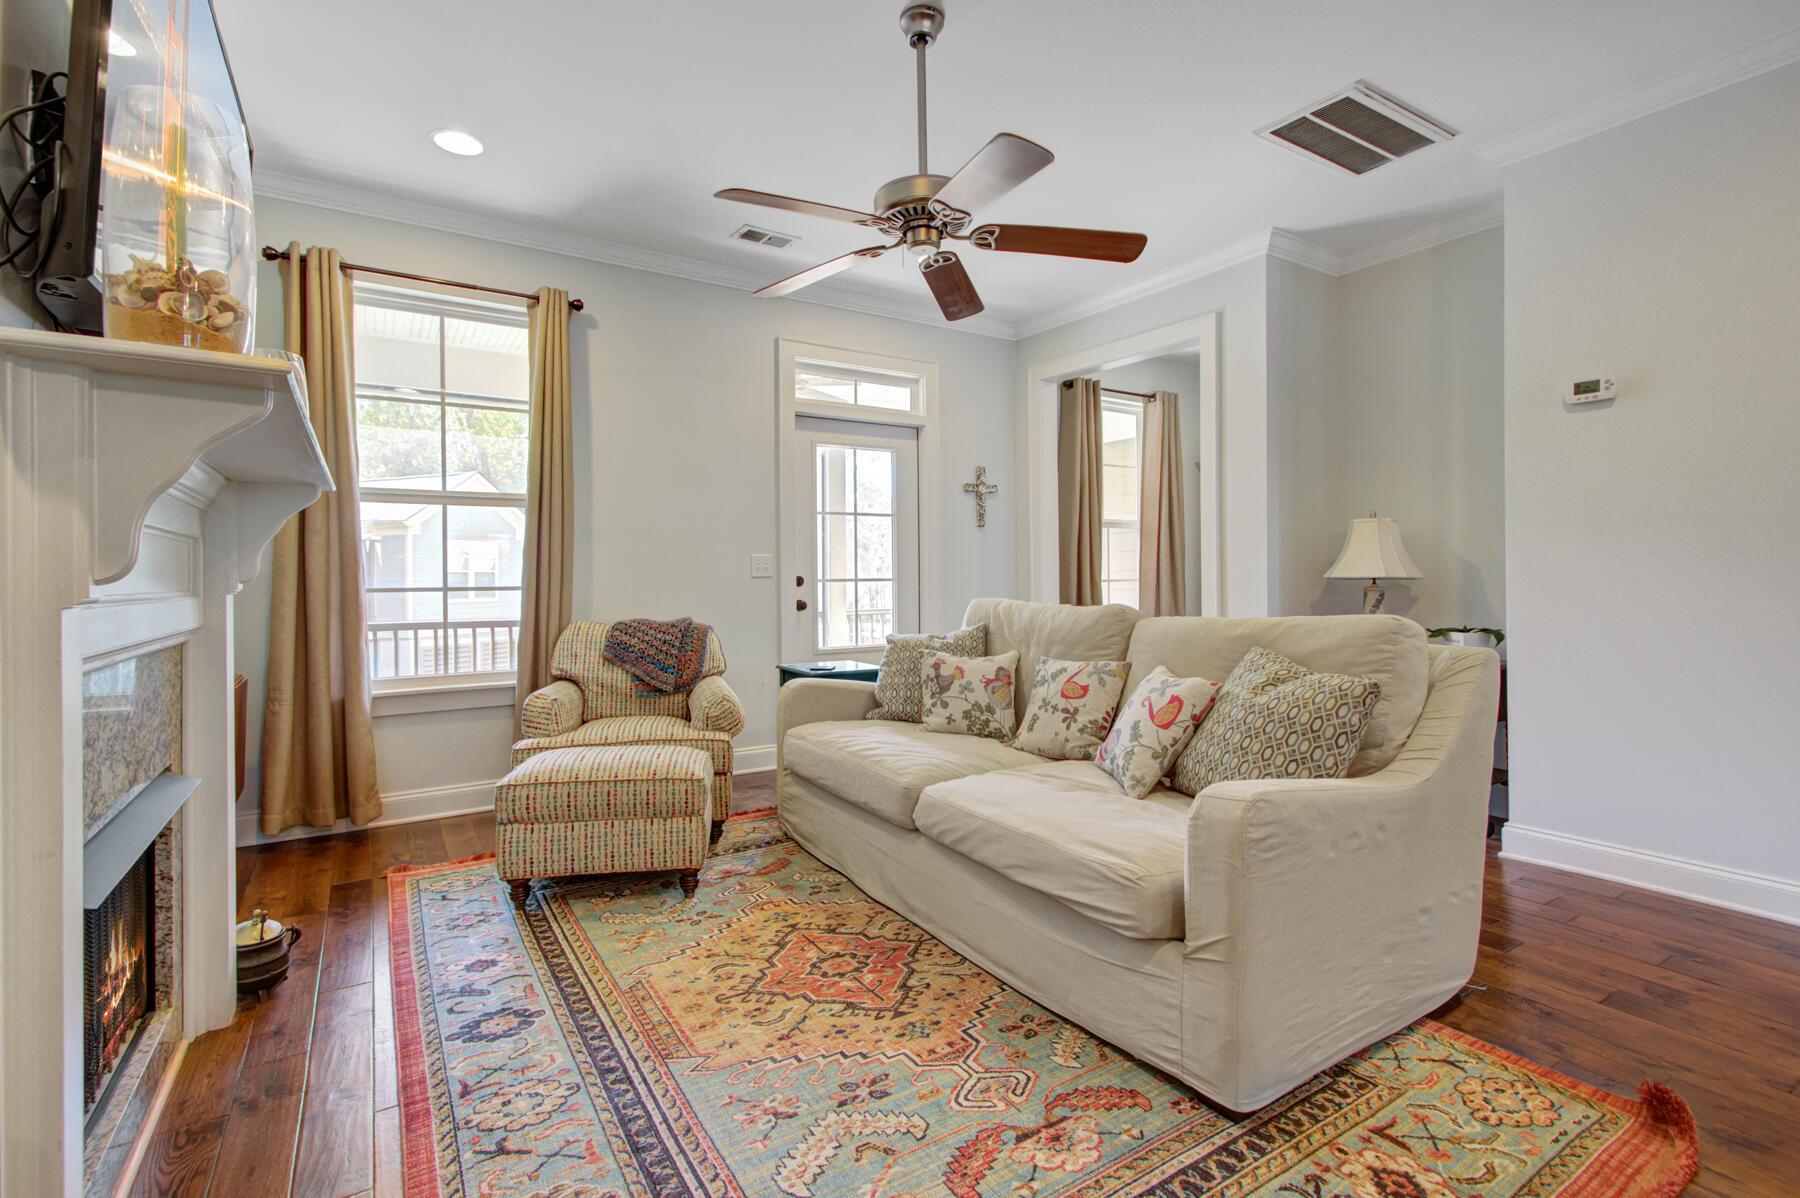 Etiwan Pointe Homes For Sale - 254 Slipper Shell, Mount Pleasant, SC - 12